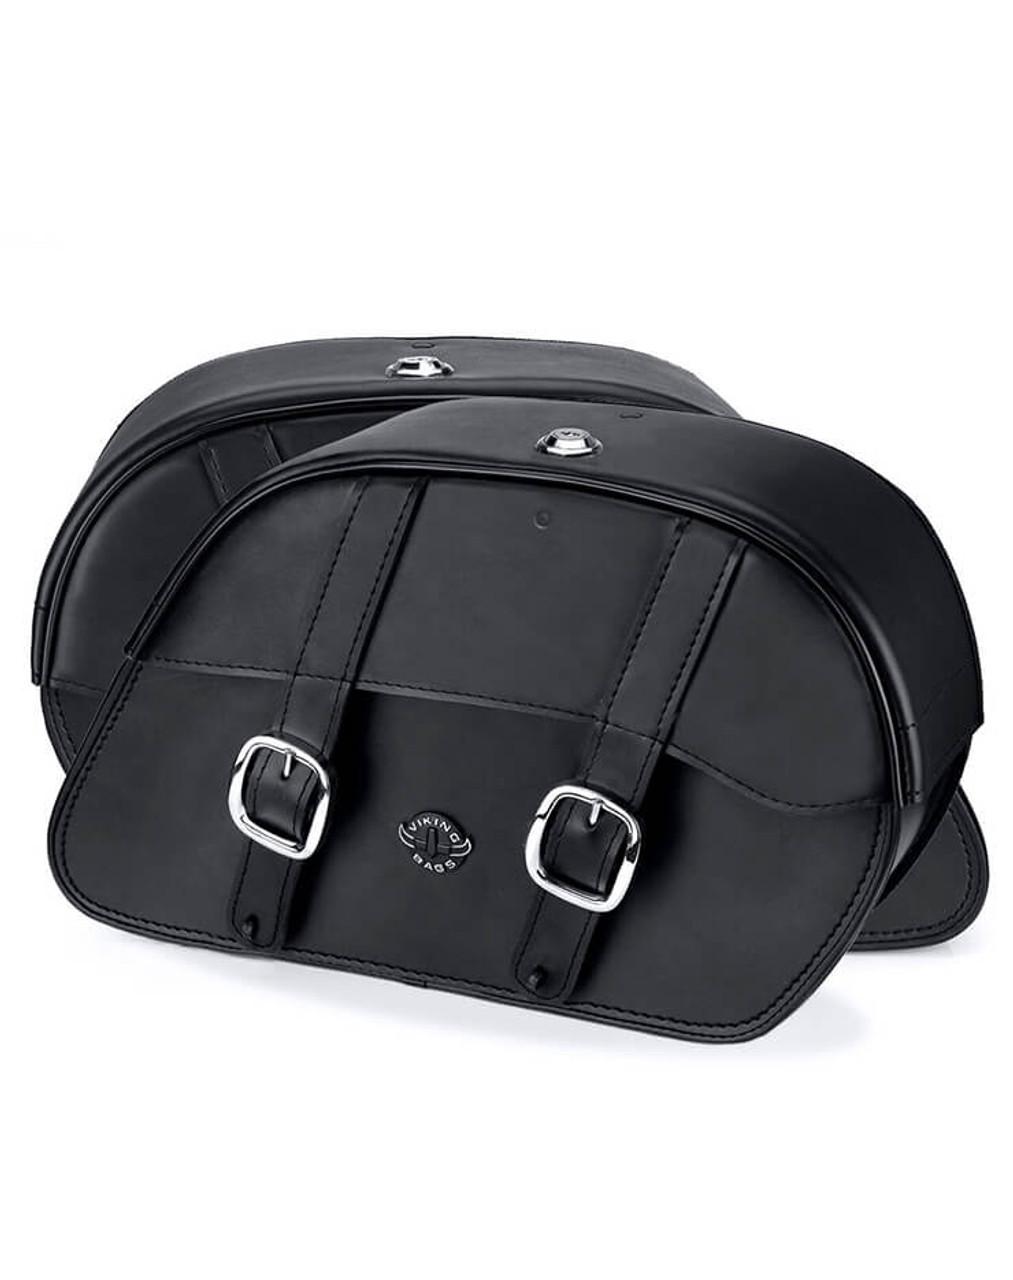 Honda 1500 Valkyrie Interstate Charger Medium Slanted Motorcycle Saddlebags Both Bags View